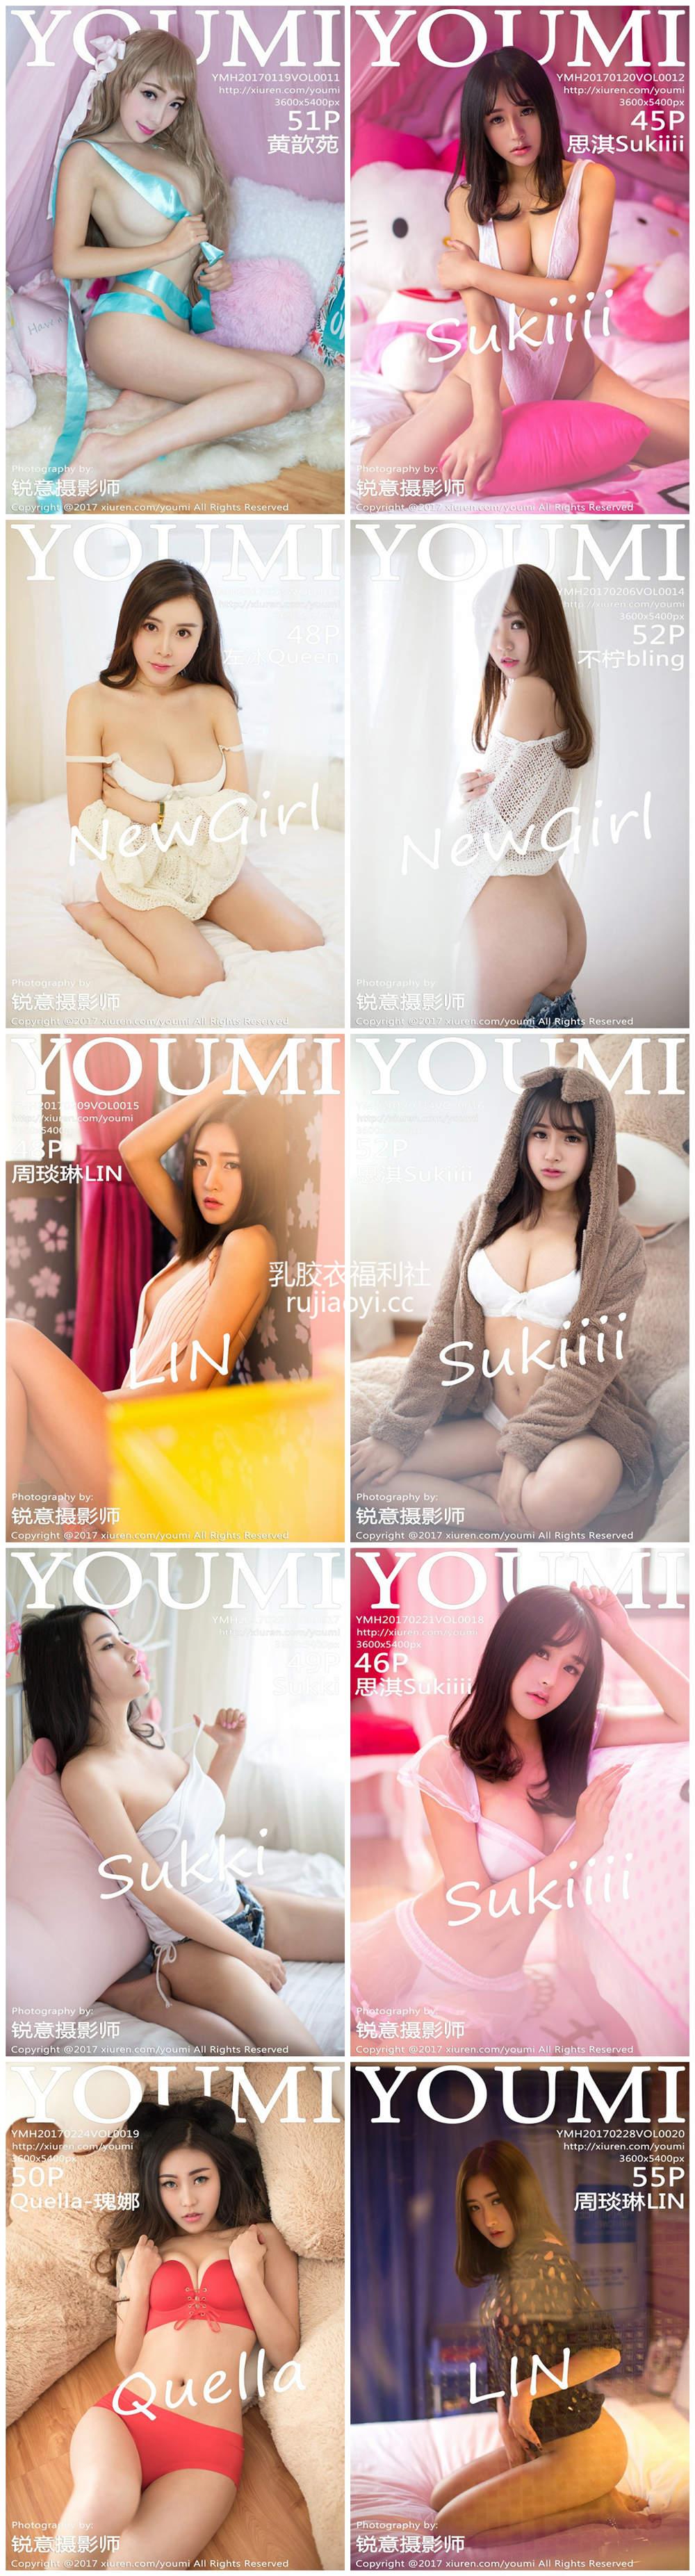 [YOUMI尤蜜荟] Vol.011-020 秀人旗下系列 10期性感美女写真百度云合集下载